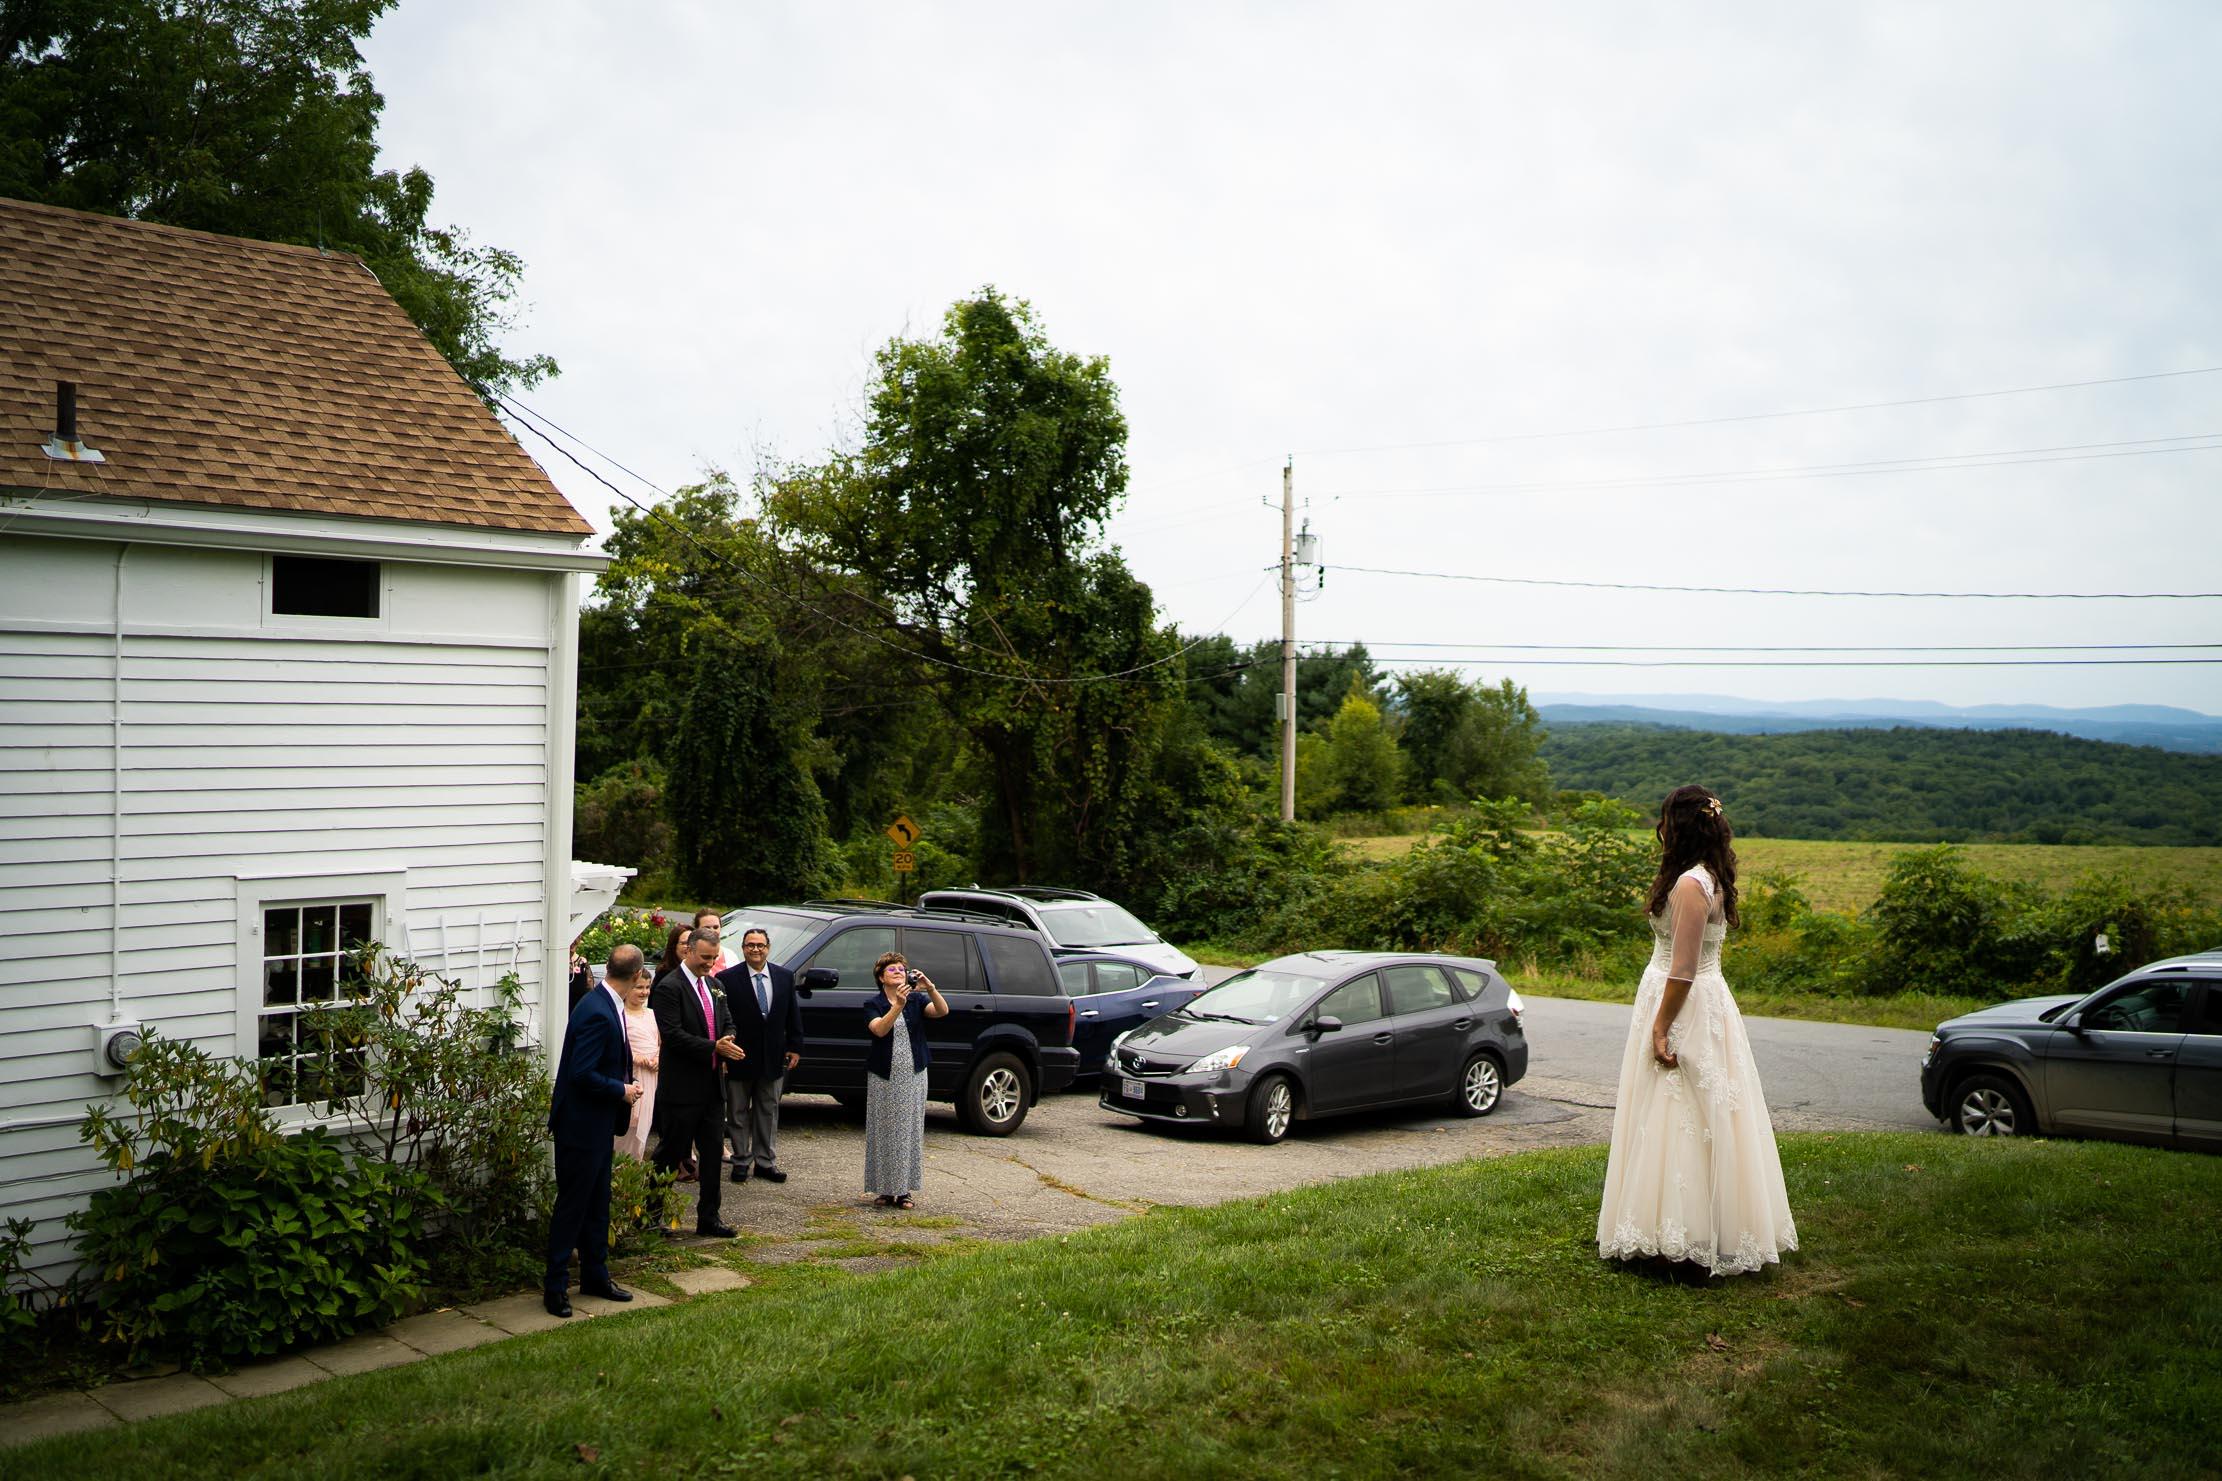 Wings-Castle-Millbrook-NY-Upstate-Wedding-Photographer-1037.jpg